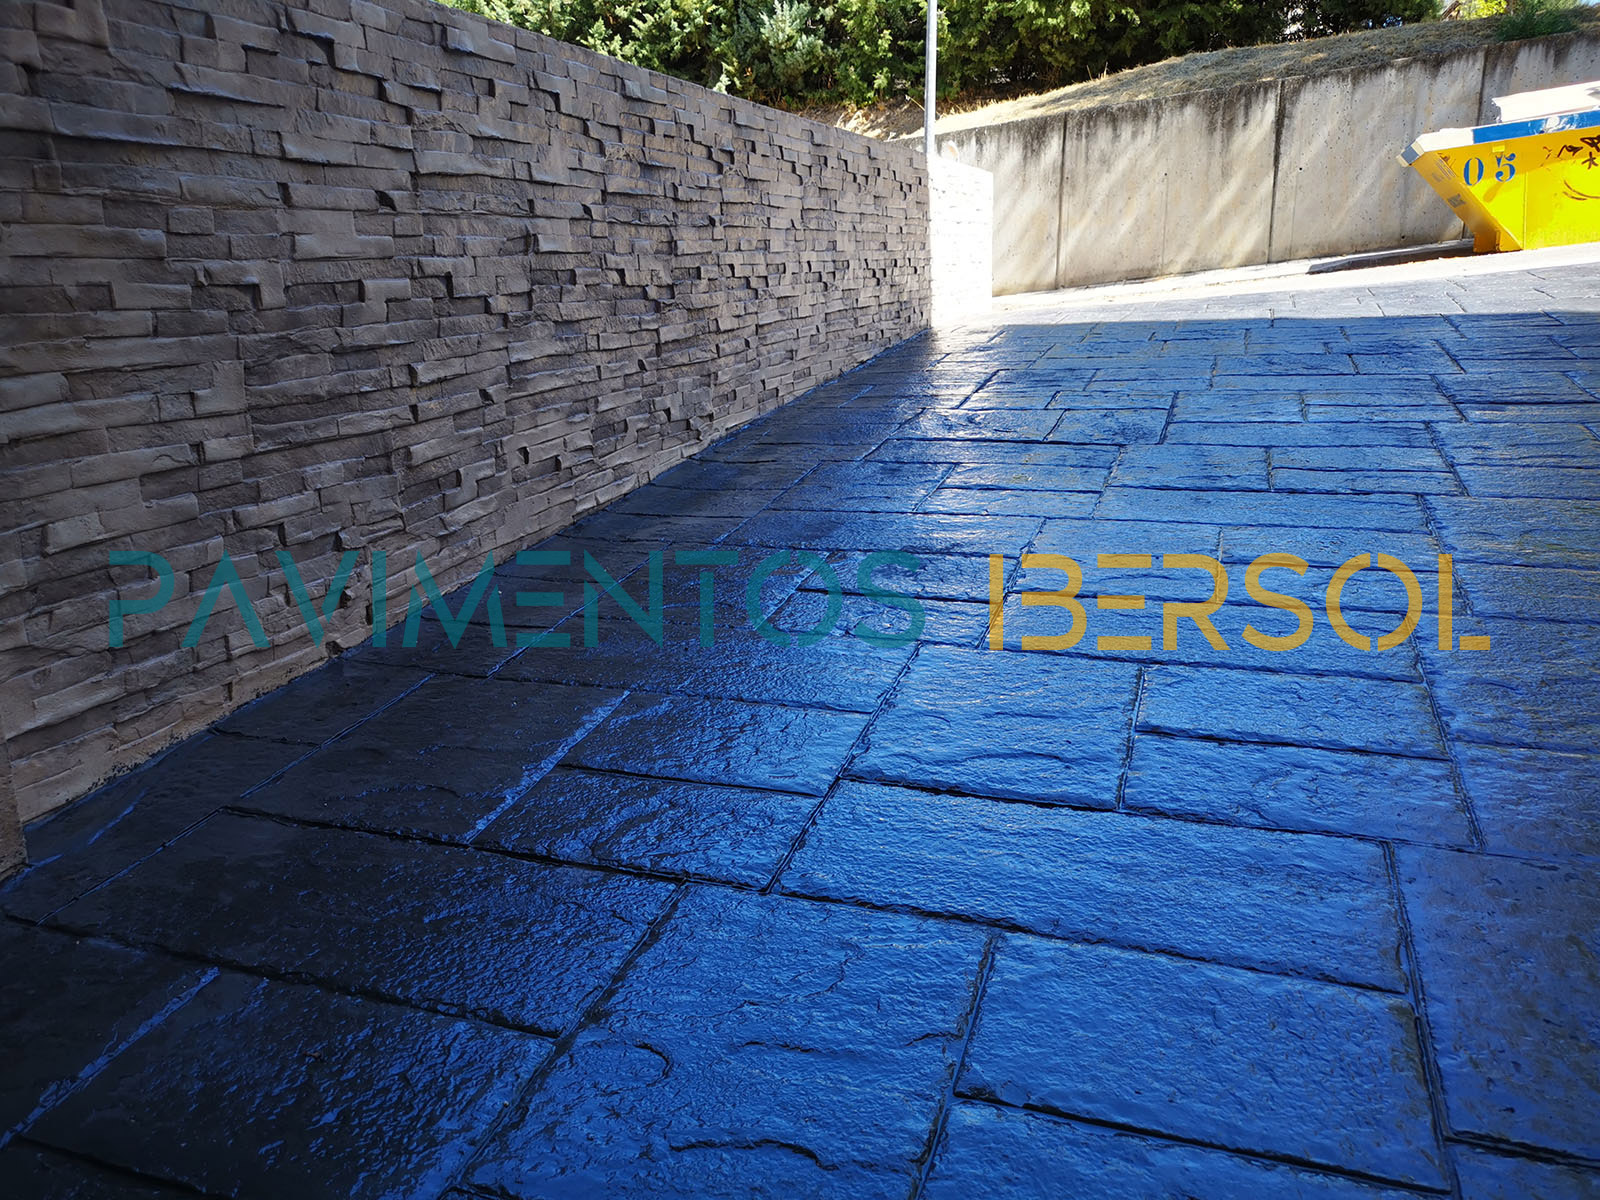 pavimento de hormigón impreso